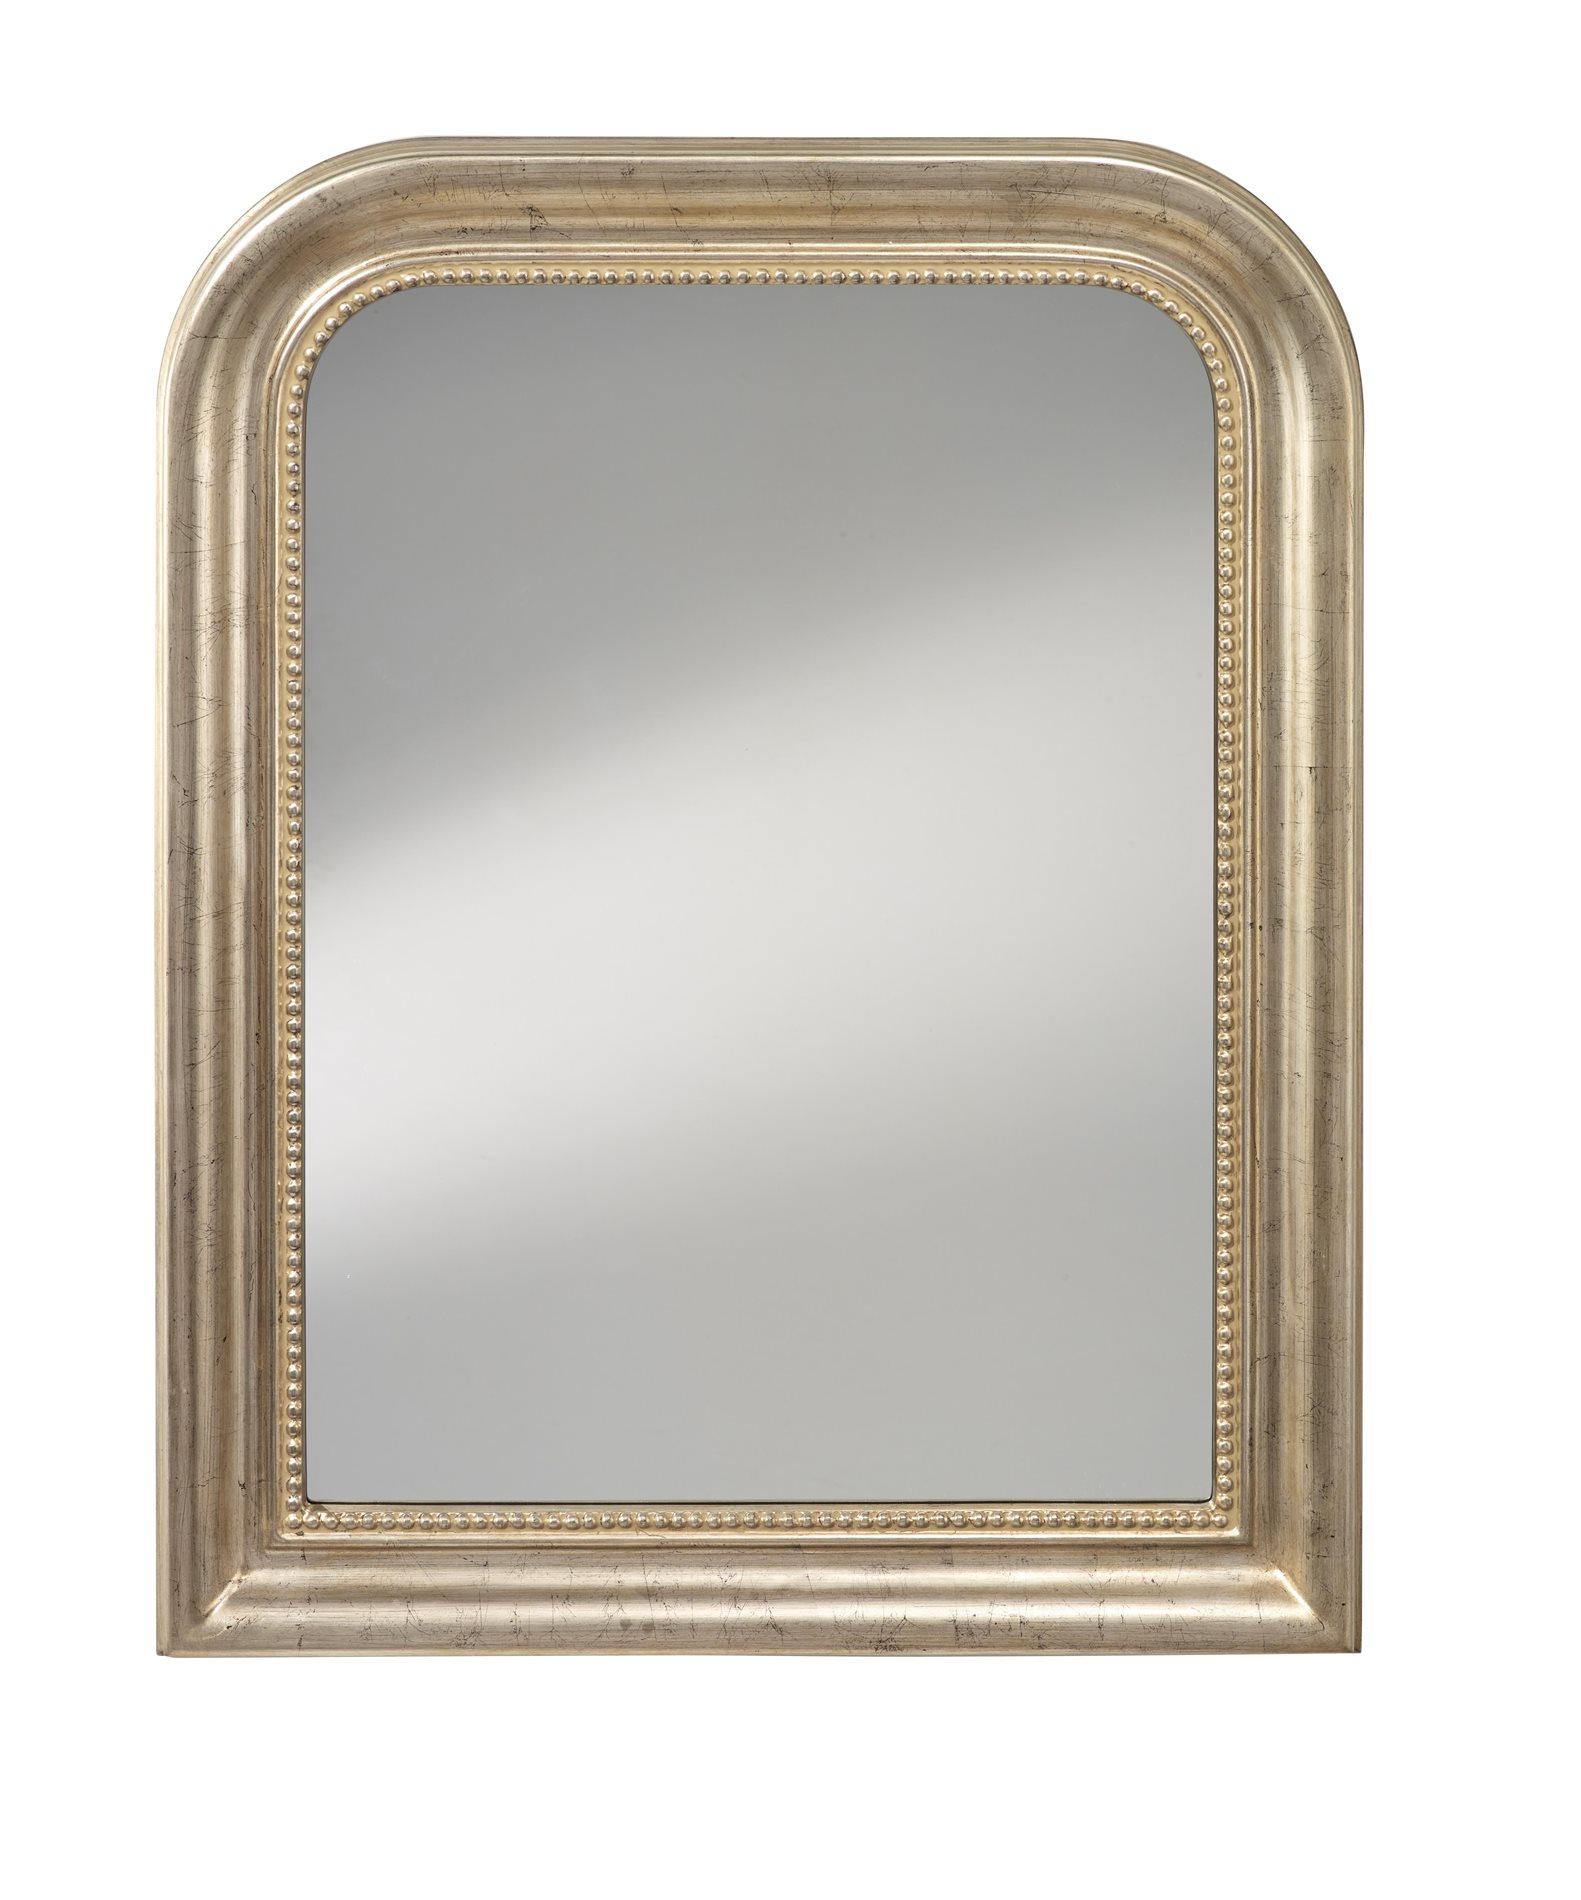 Murray Feiss Mirrors: Murray Feiss MR1212DSL Mirror MRF-MR1212DSL